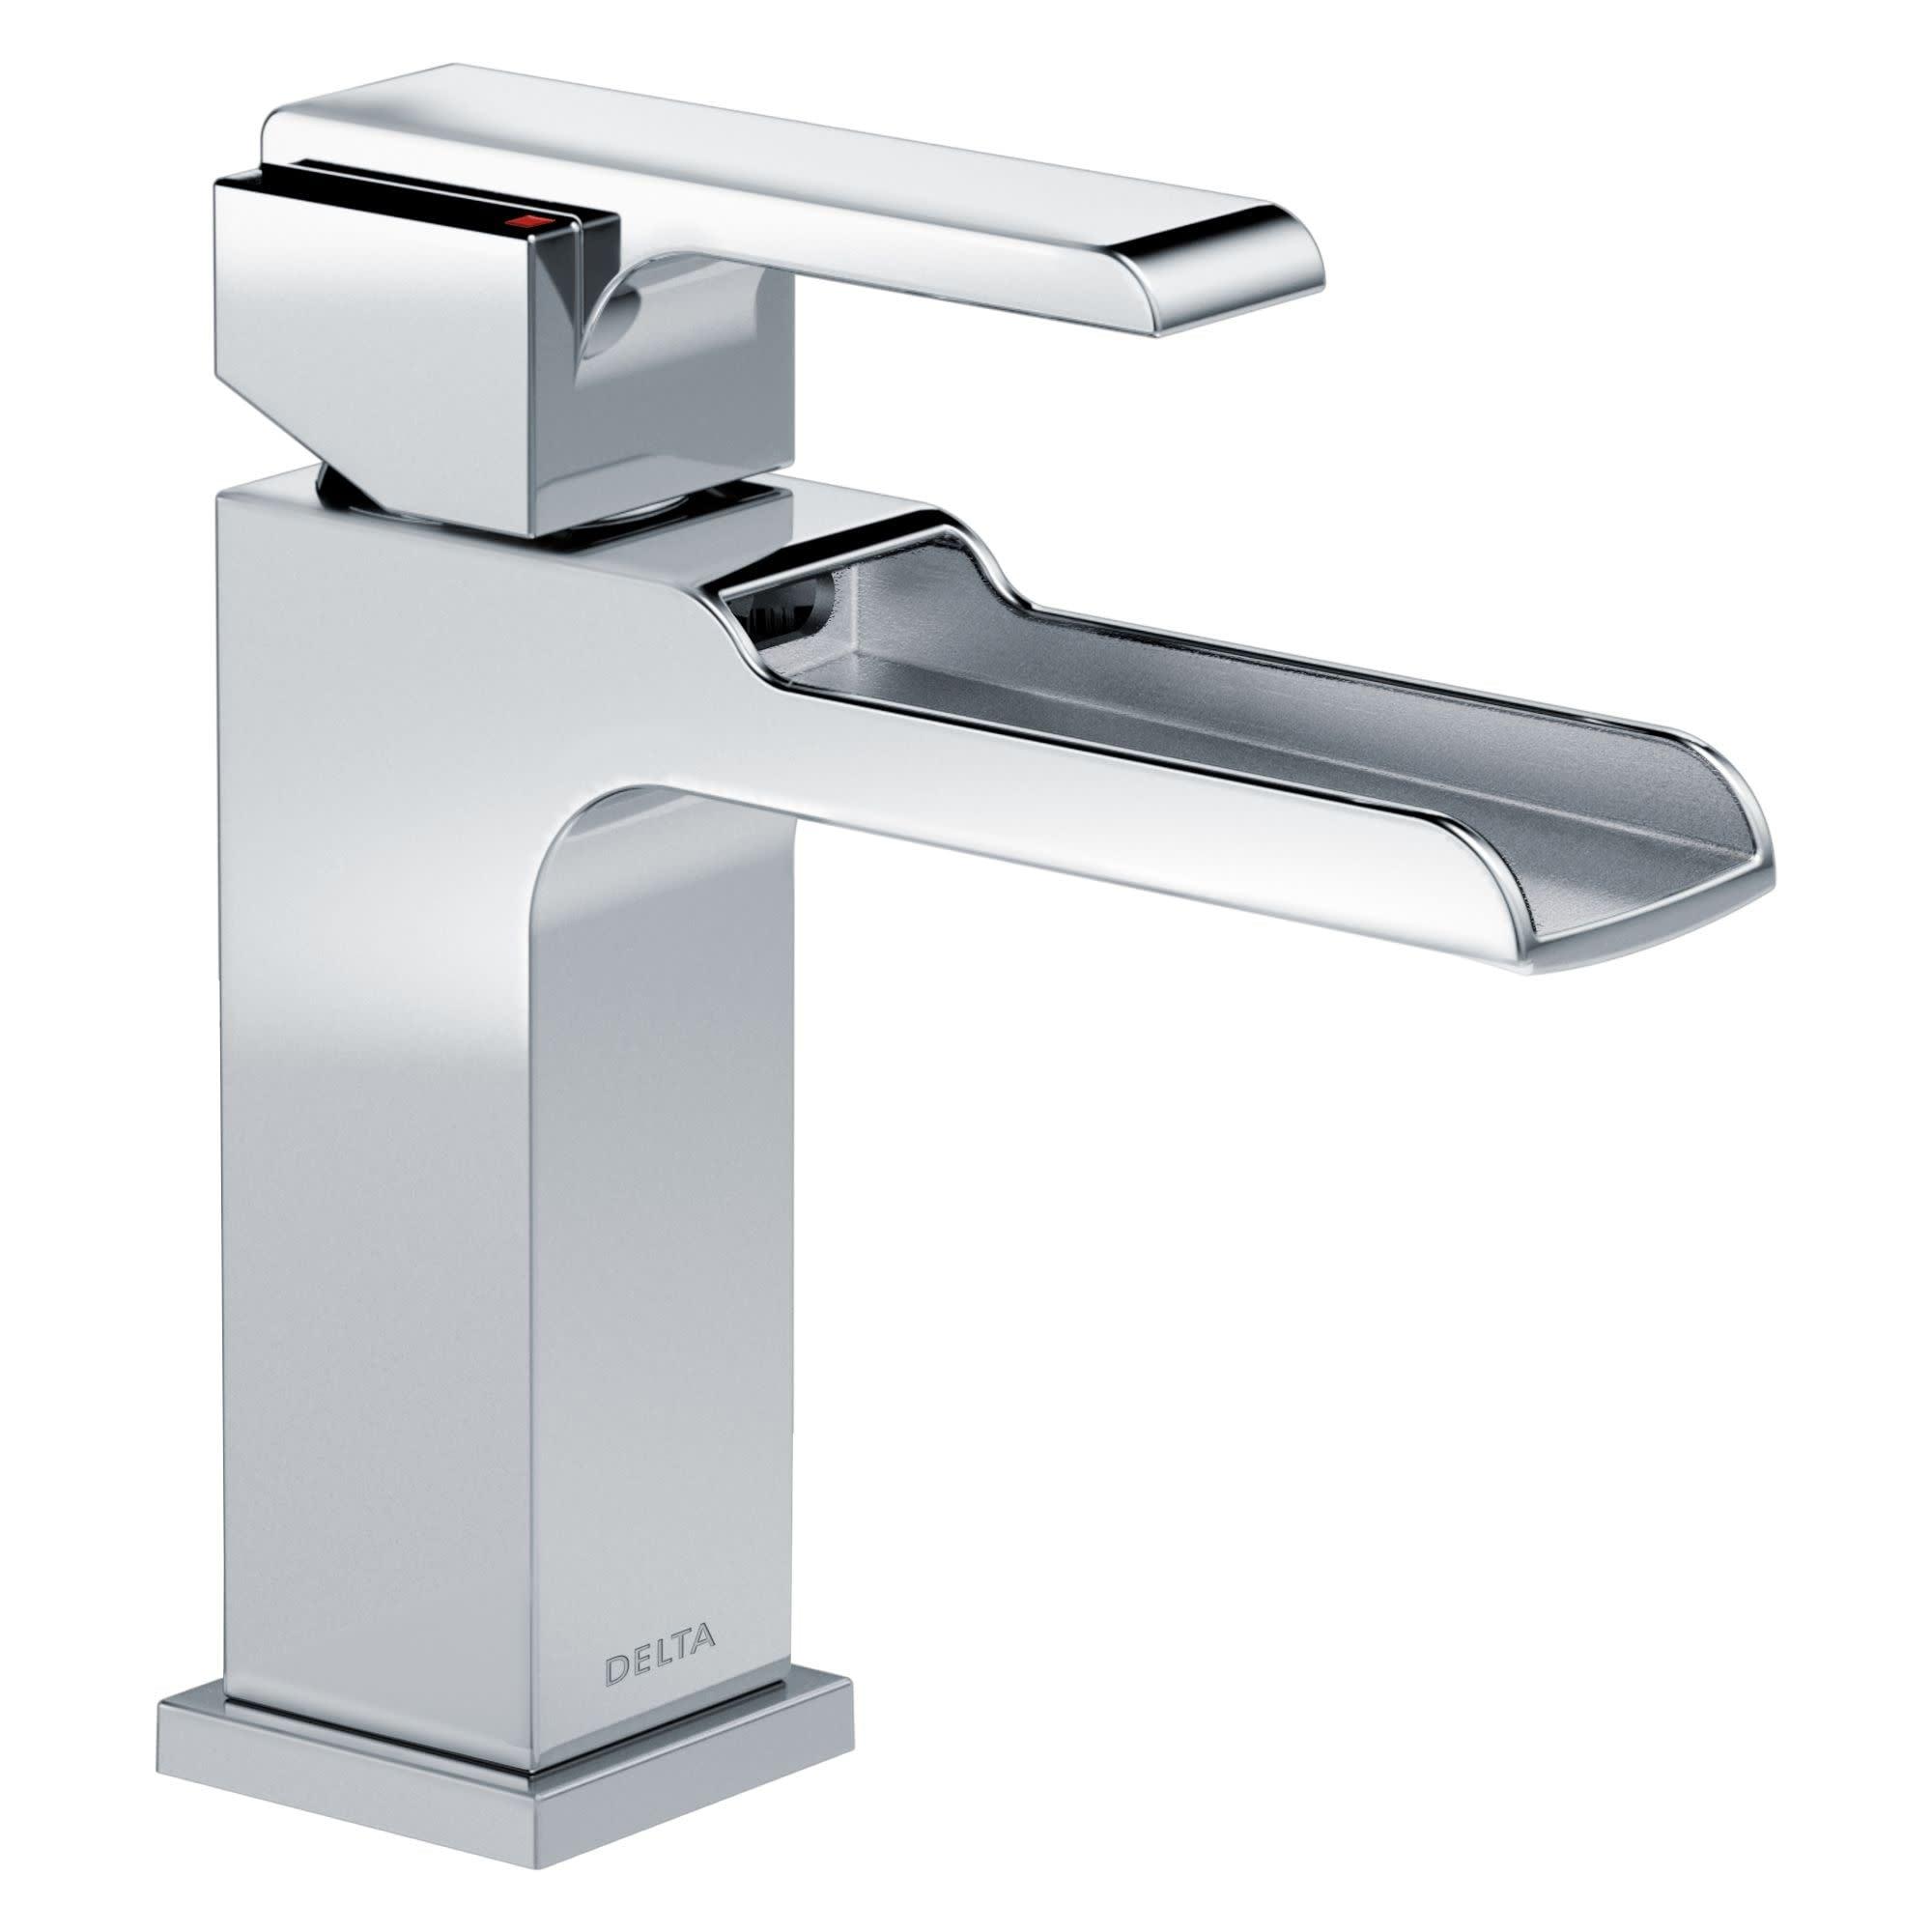 Image of: Shop Black Friday Deals On Delta 568lf Lpu Ara 1 2 Gpm Single Hole Waterfall Bathroom Faucet Overstock 17032797